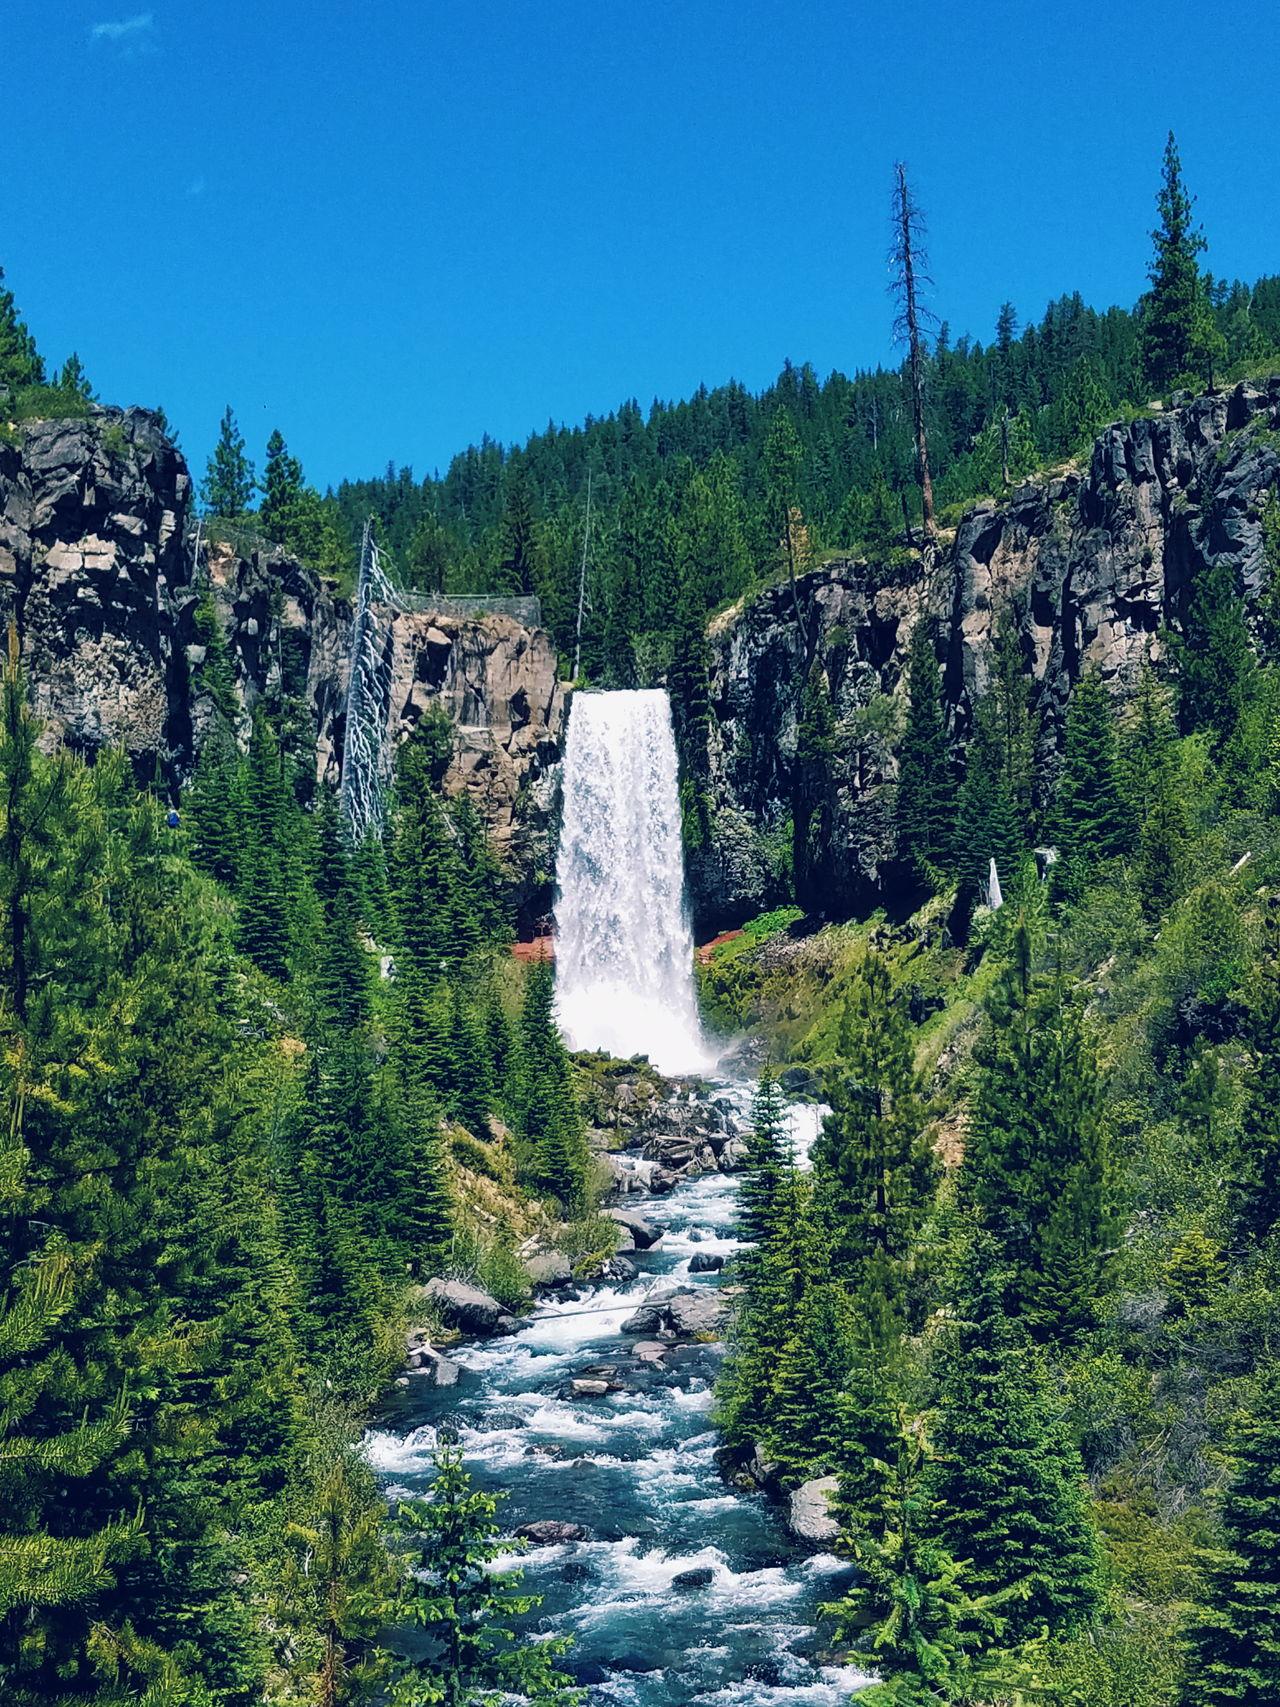 Tumalo Falls Bend Oregon Central Oregon Waterfall Trees Hiking Adventure Exploring Water